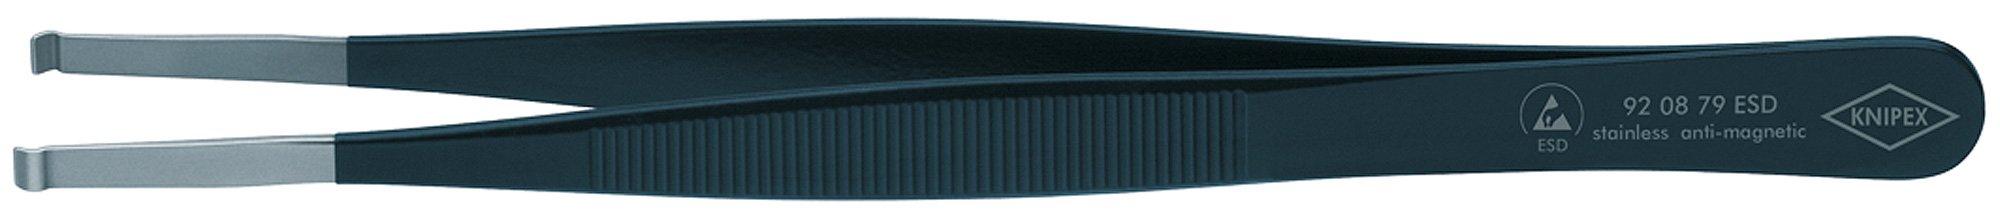 Knipex 92 08 79 ESD Precision Tweezers ESD